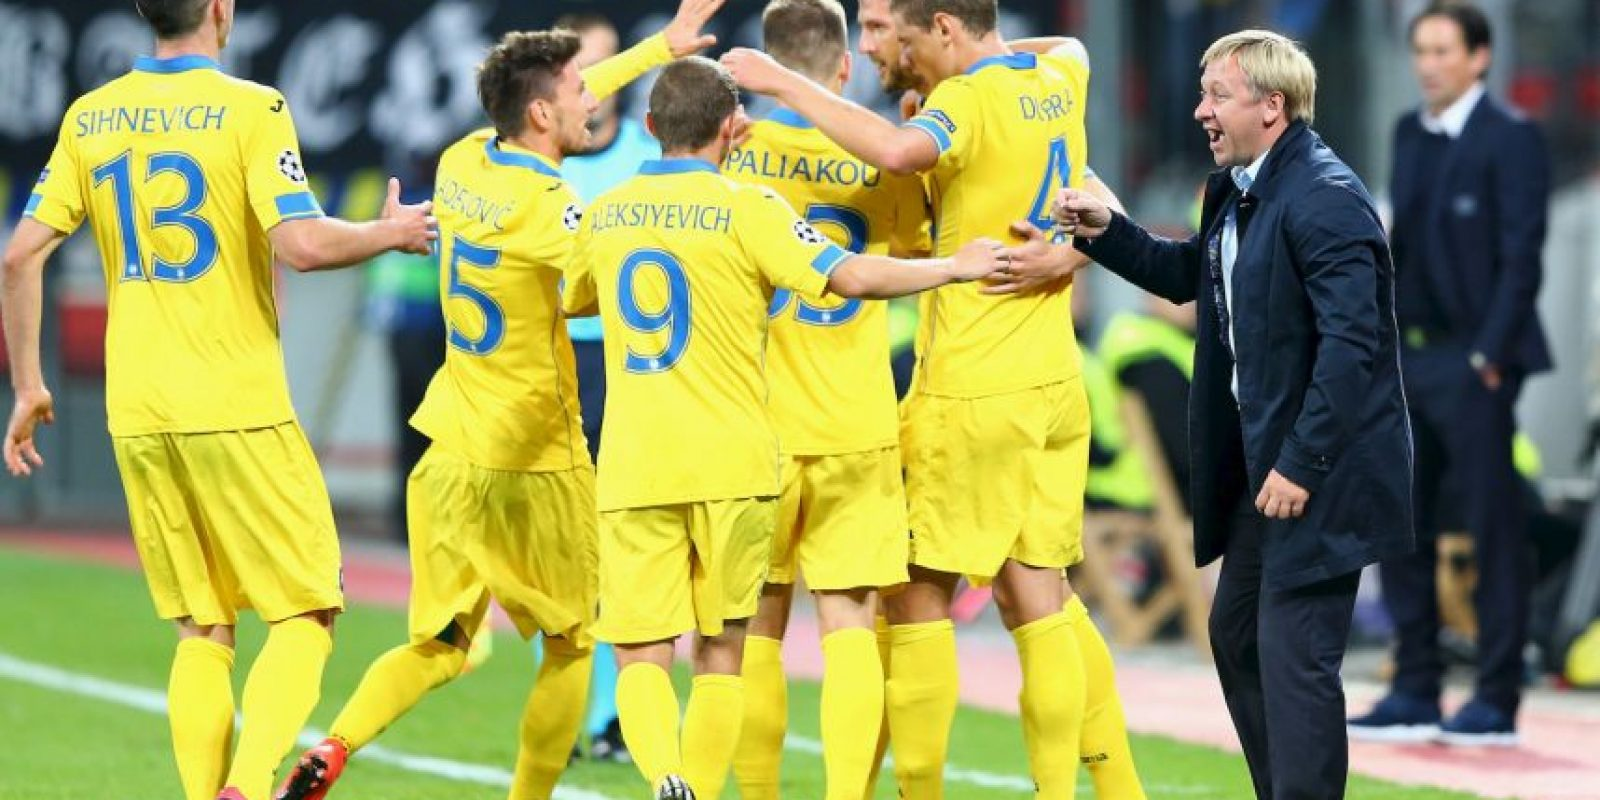 En la jornada 2, BATE sorprendió a la Roma y los venció 3-2. Foto:Getty Images